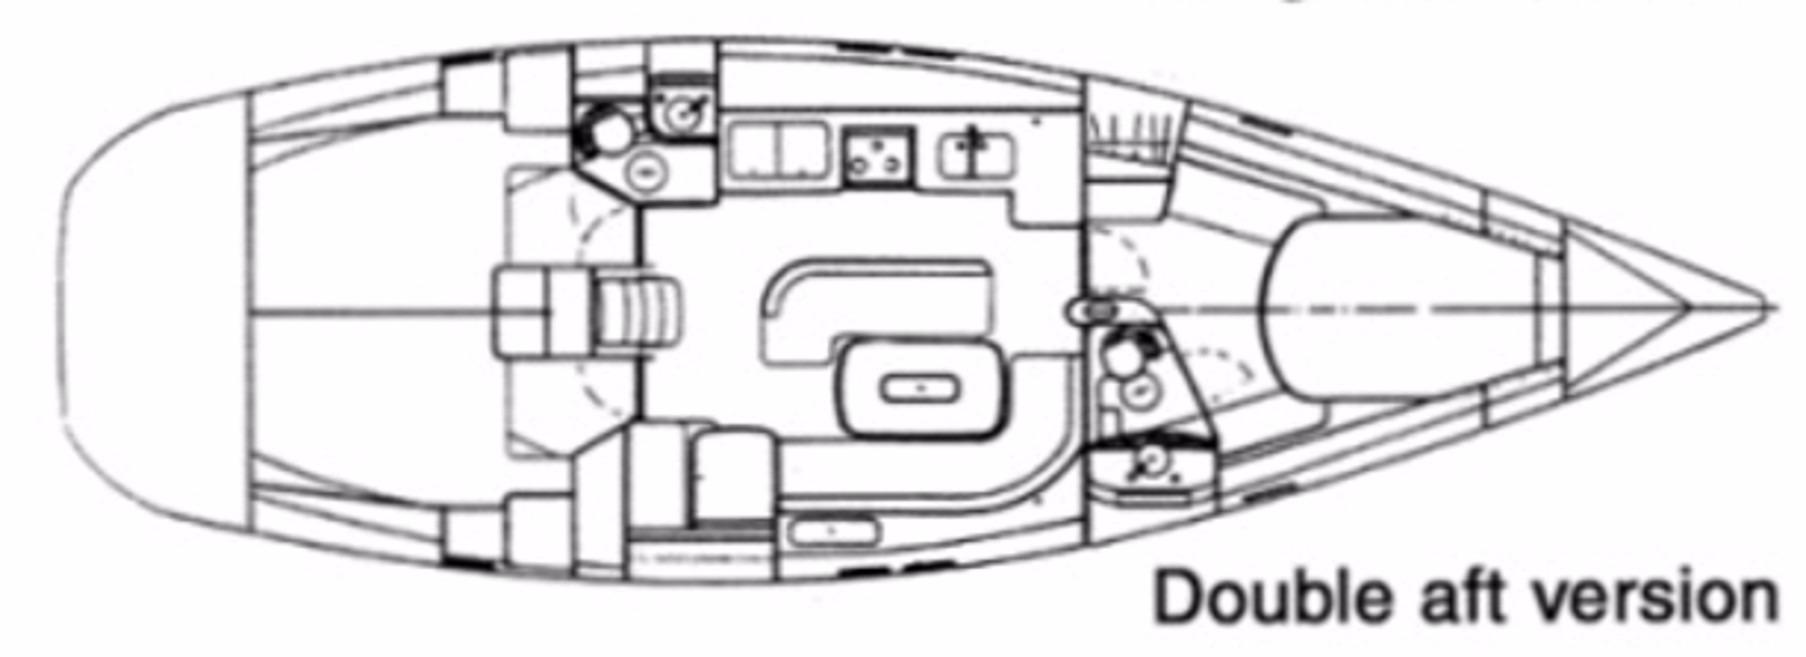 44' Beneteau Oceanis 440 Aft Cockpit Sloop+Cockpit